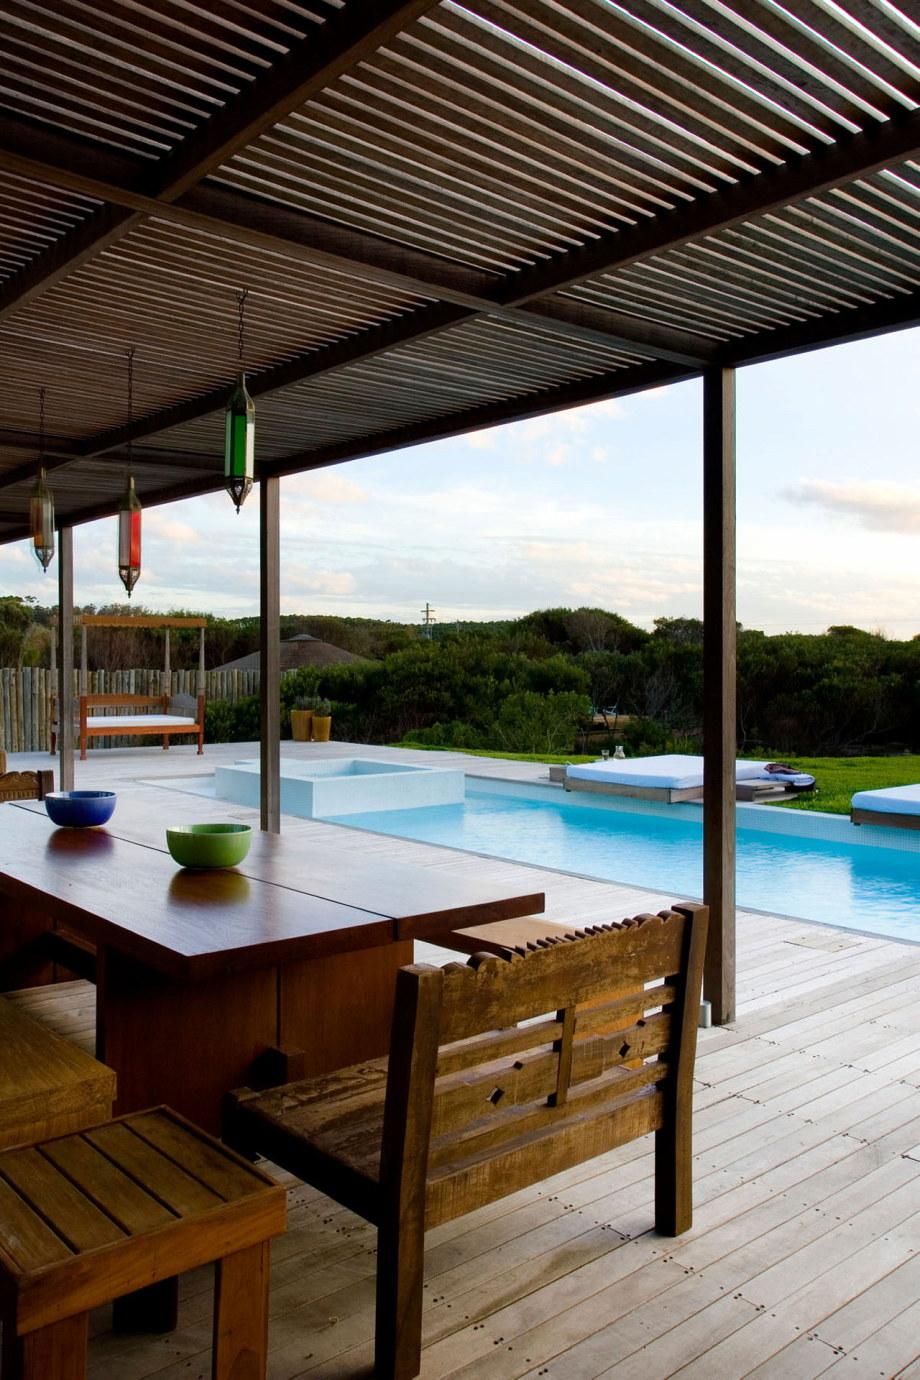 The beach house La Boyita Residence by Martin Gomez Arguitectos, Uruguay 15